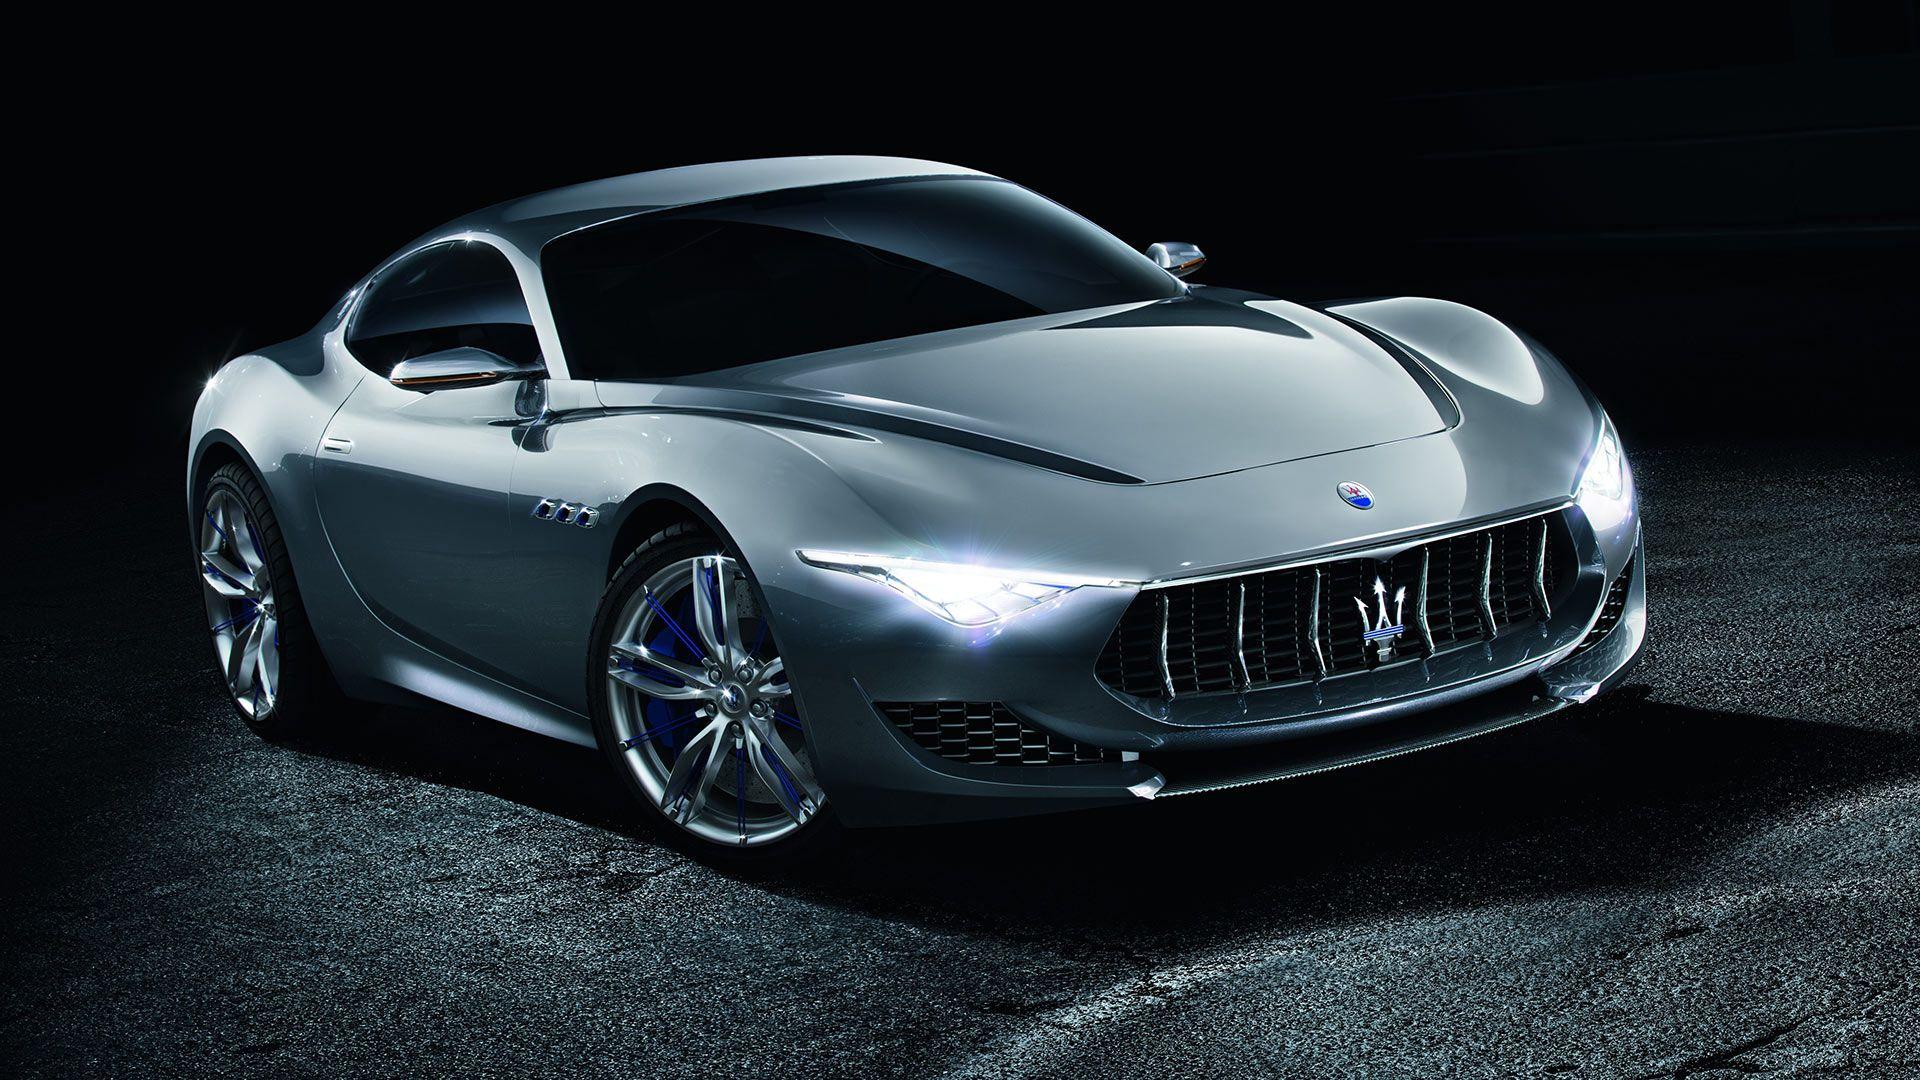 Maserati Alfieri You Little Beauty I Love Cool Cars Http - We love cool cars